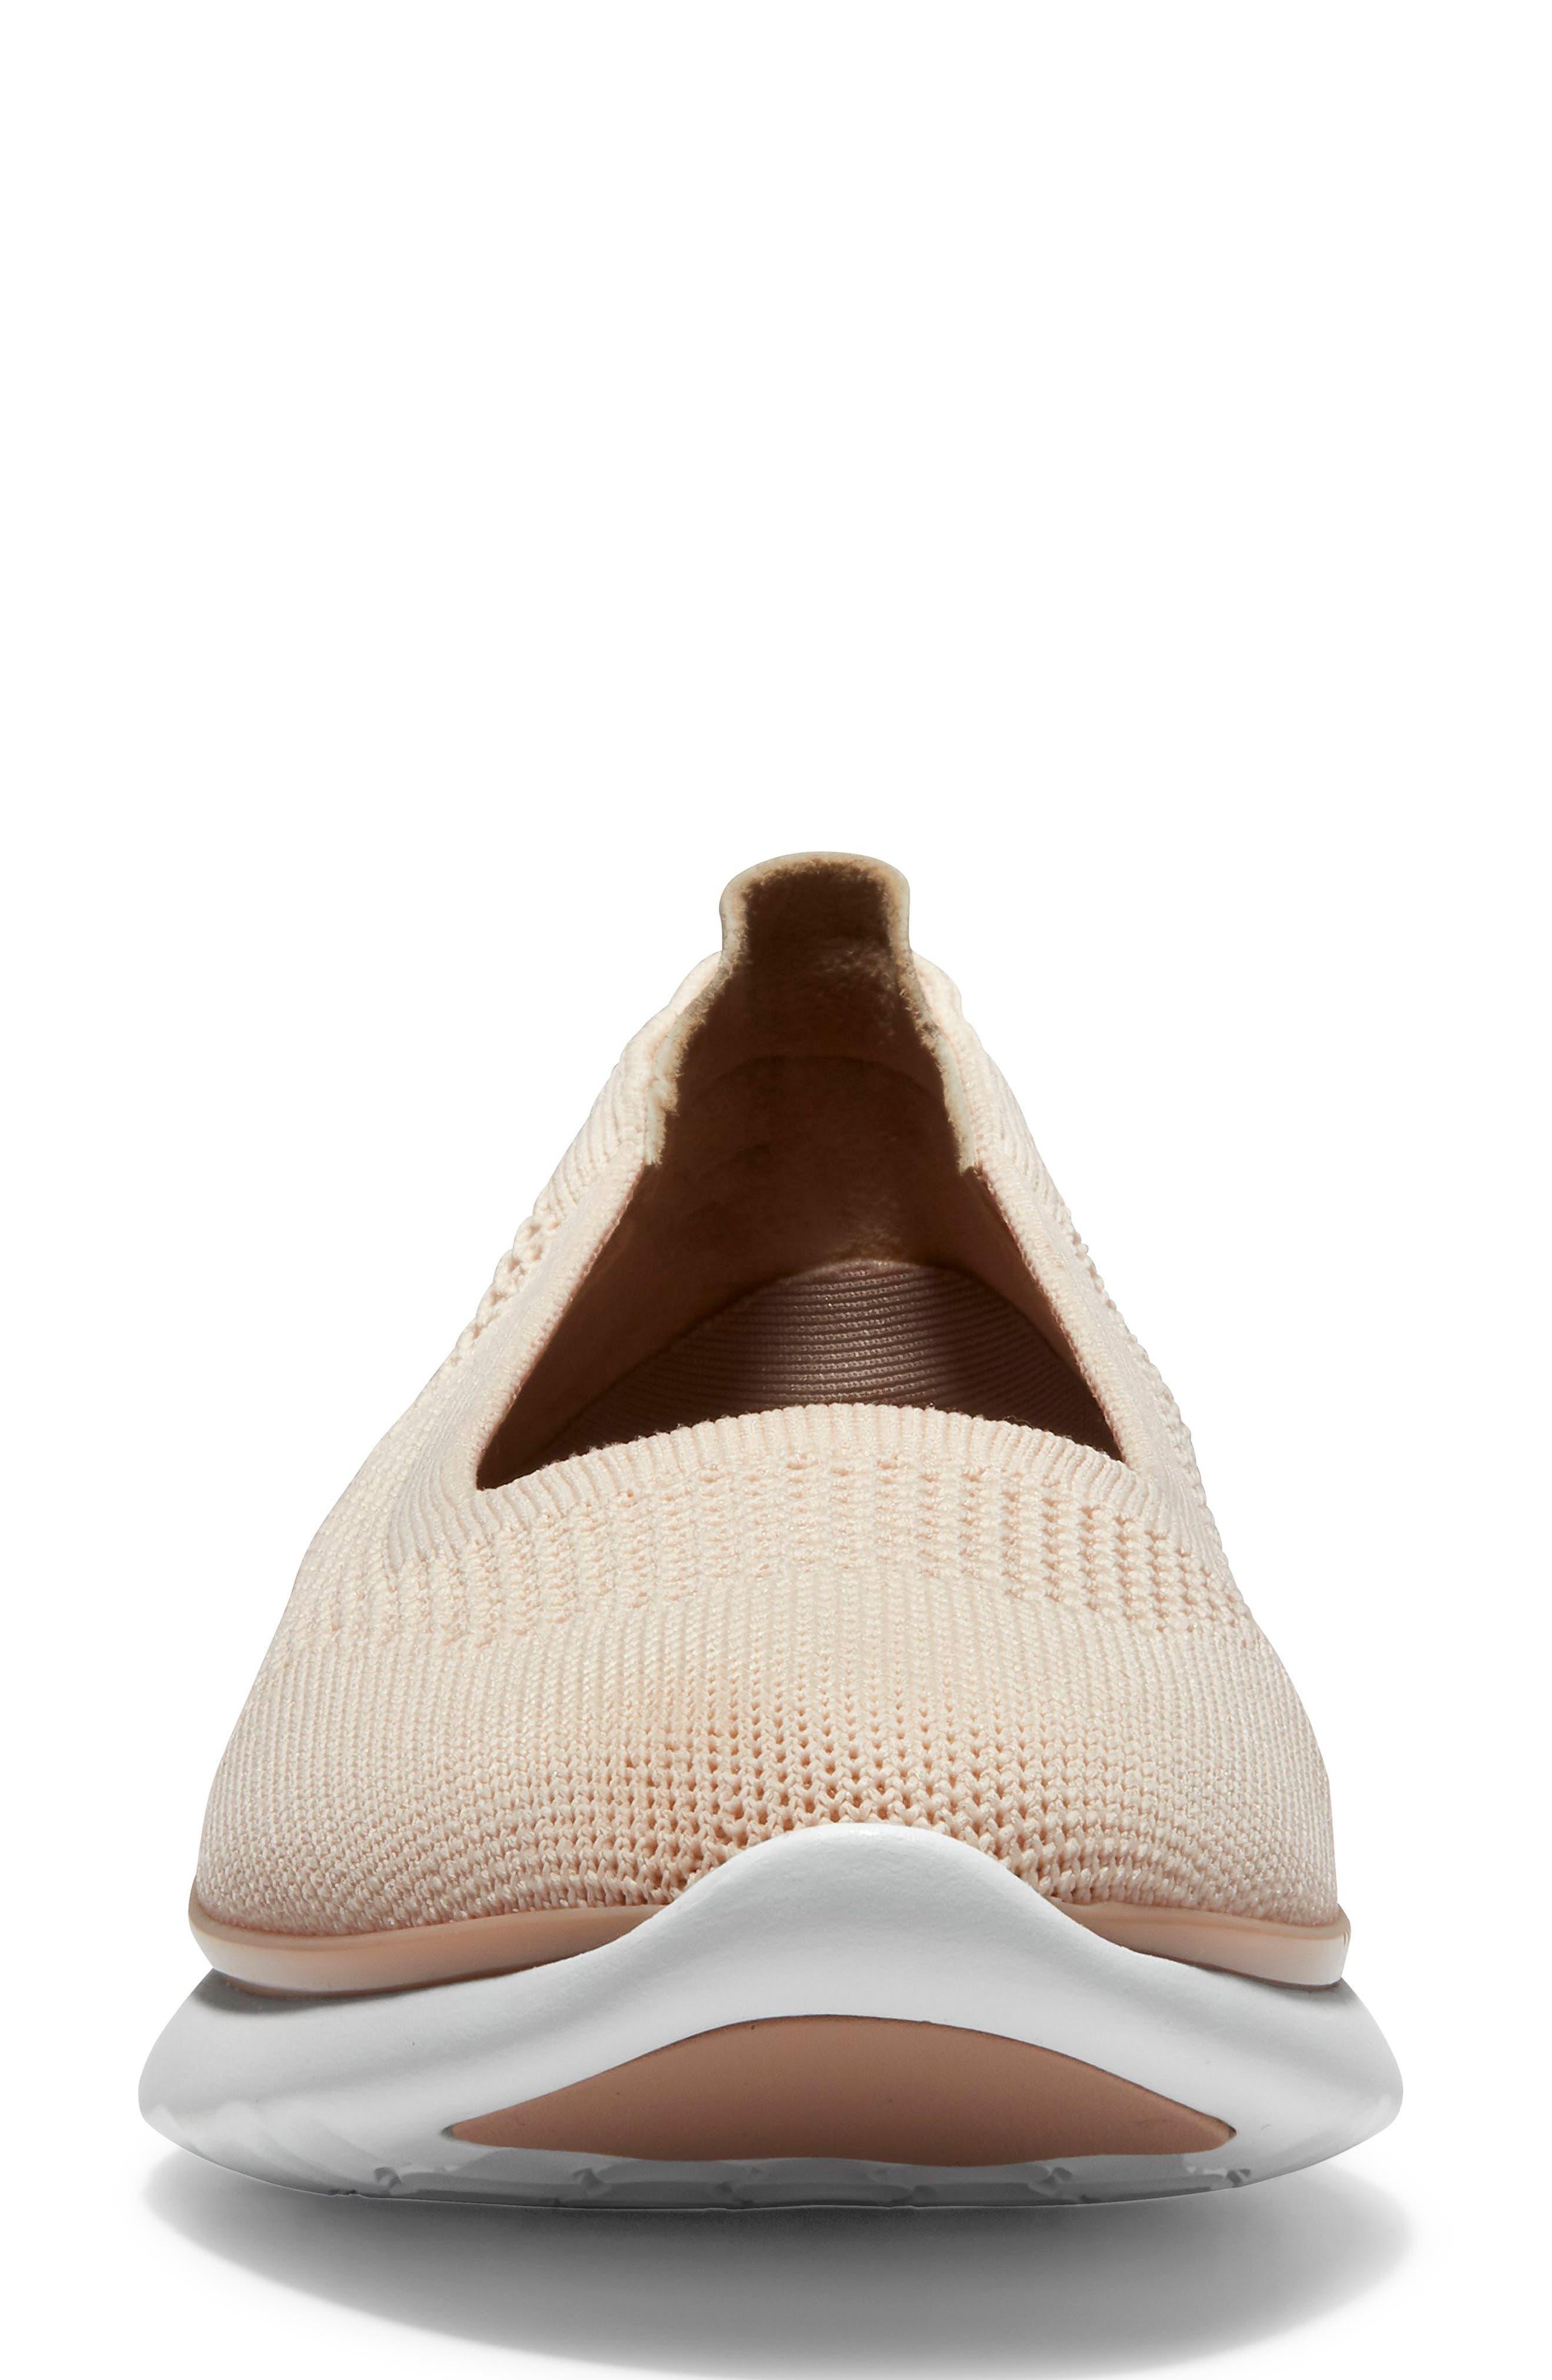 ZeroGrand Knit Sneaker,                             Alternate thumbnail 4, color,                             SAND/ ROSE KNIT/ LEATHER